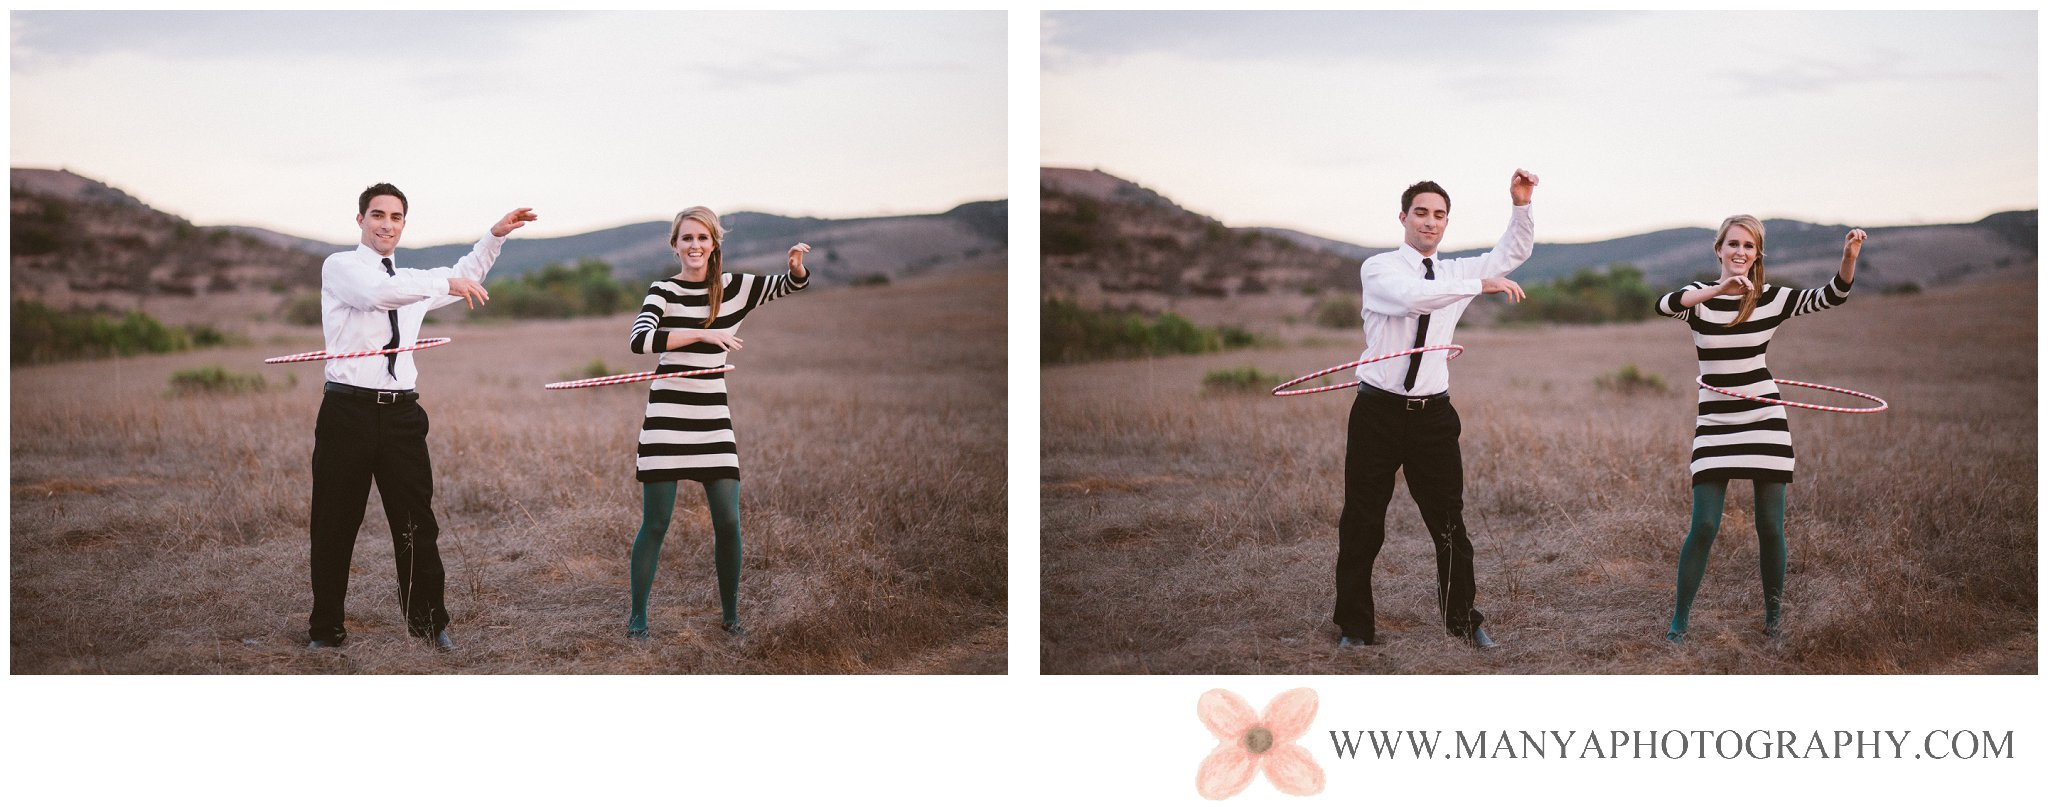 2013-10-17_0046 - Orange County Wedding Photographer